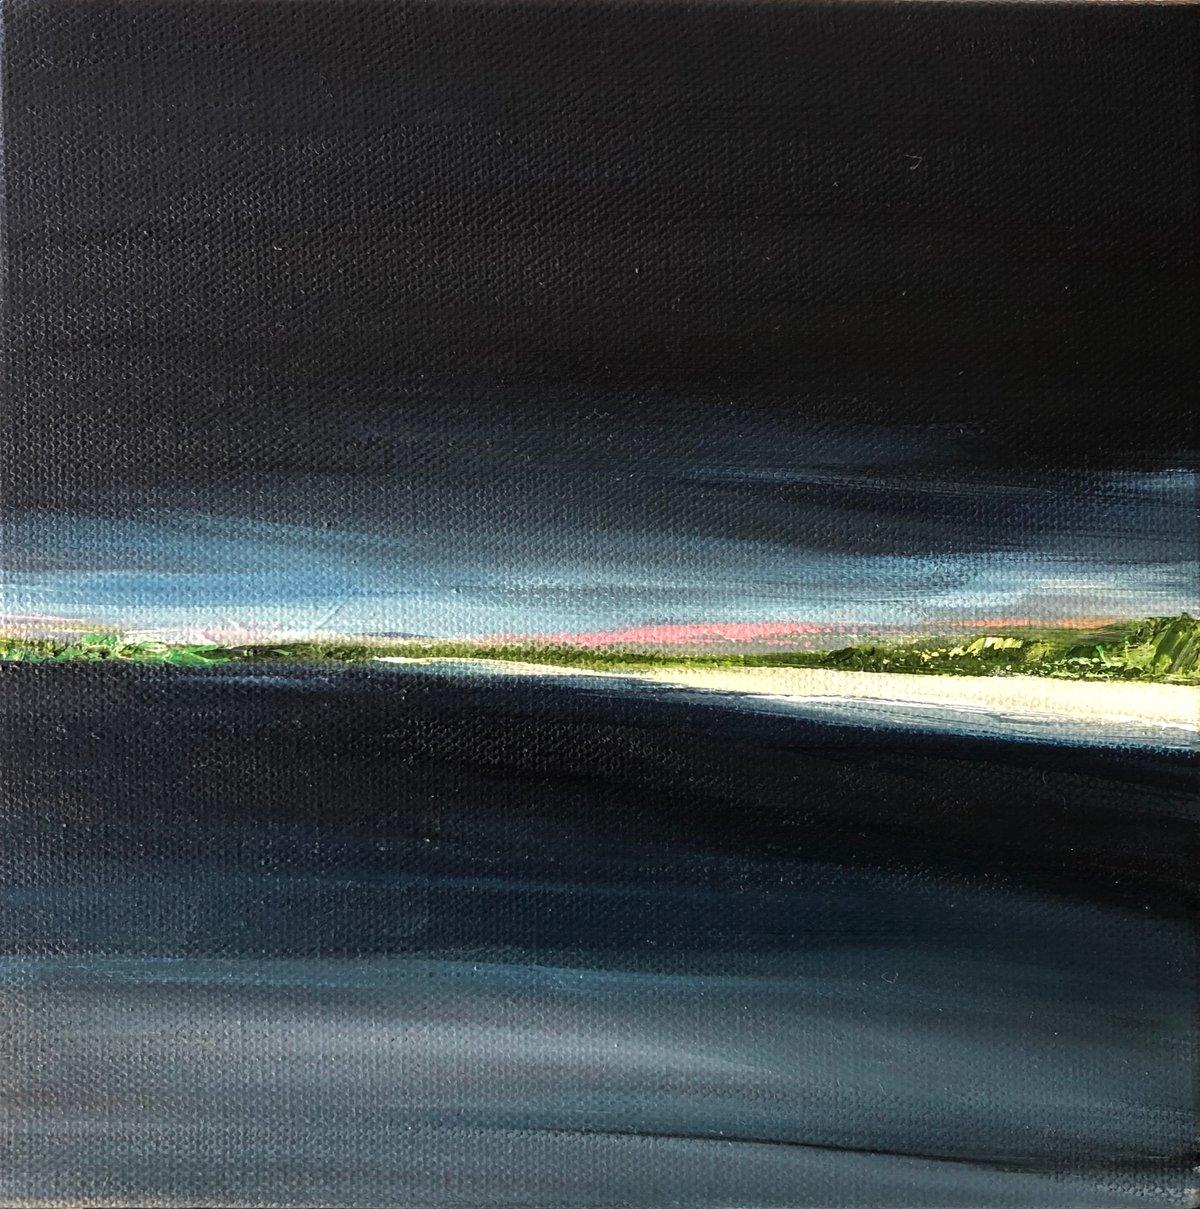 Image of Indigo Sky 2020. Oil on canvas